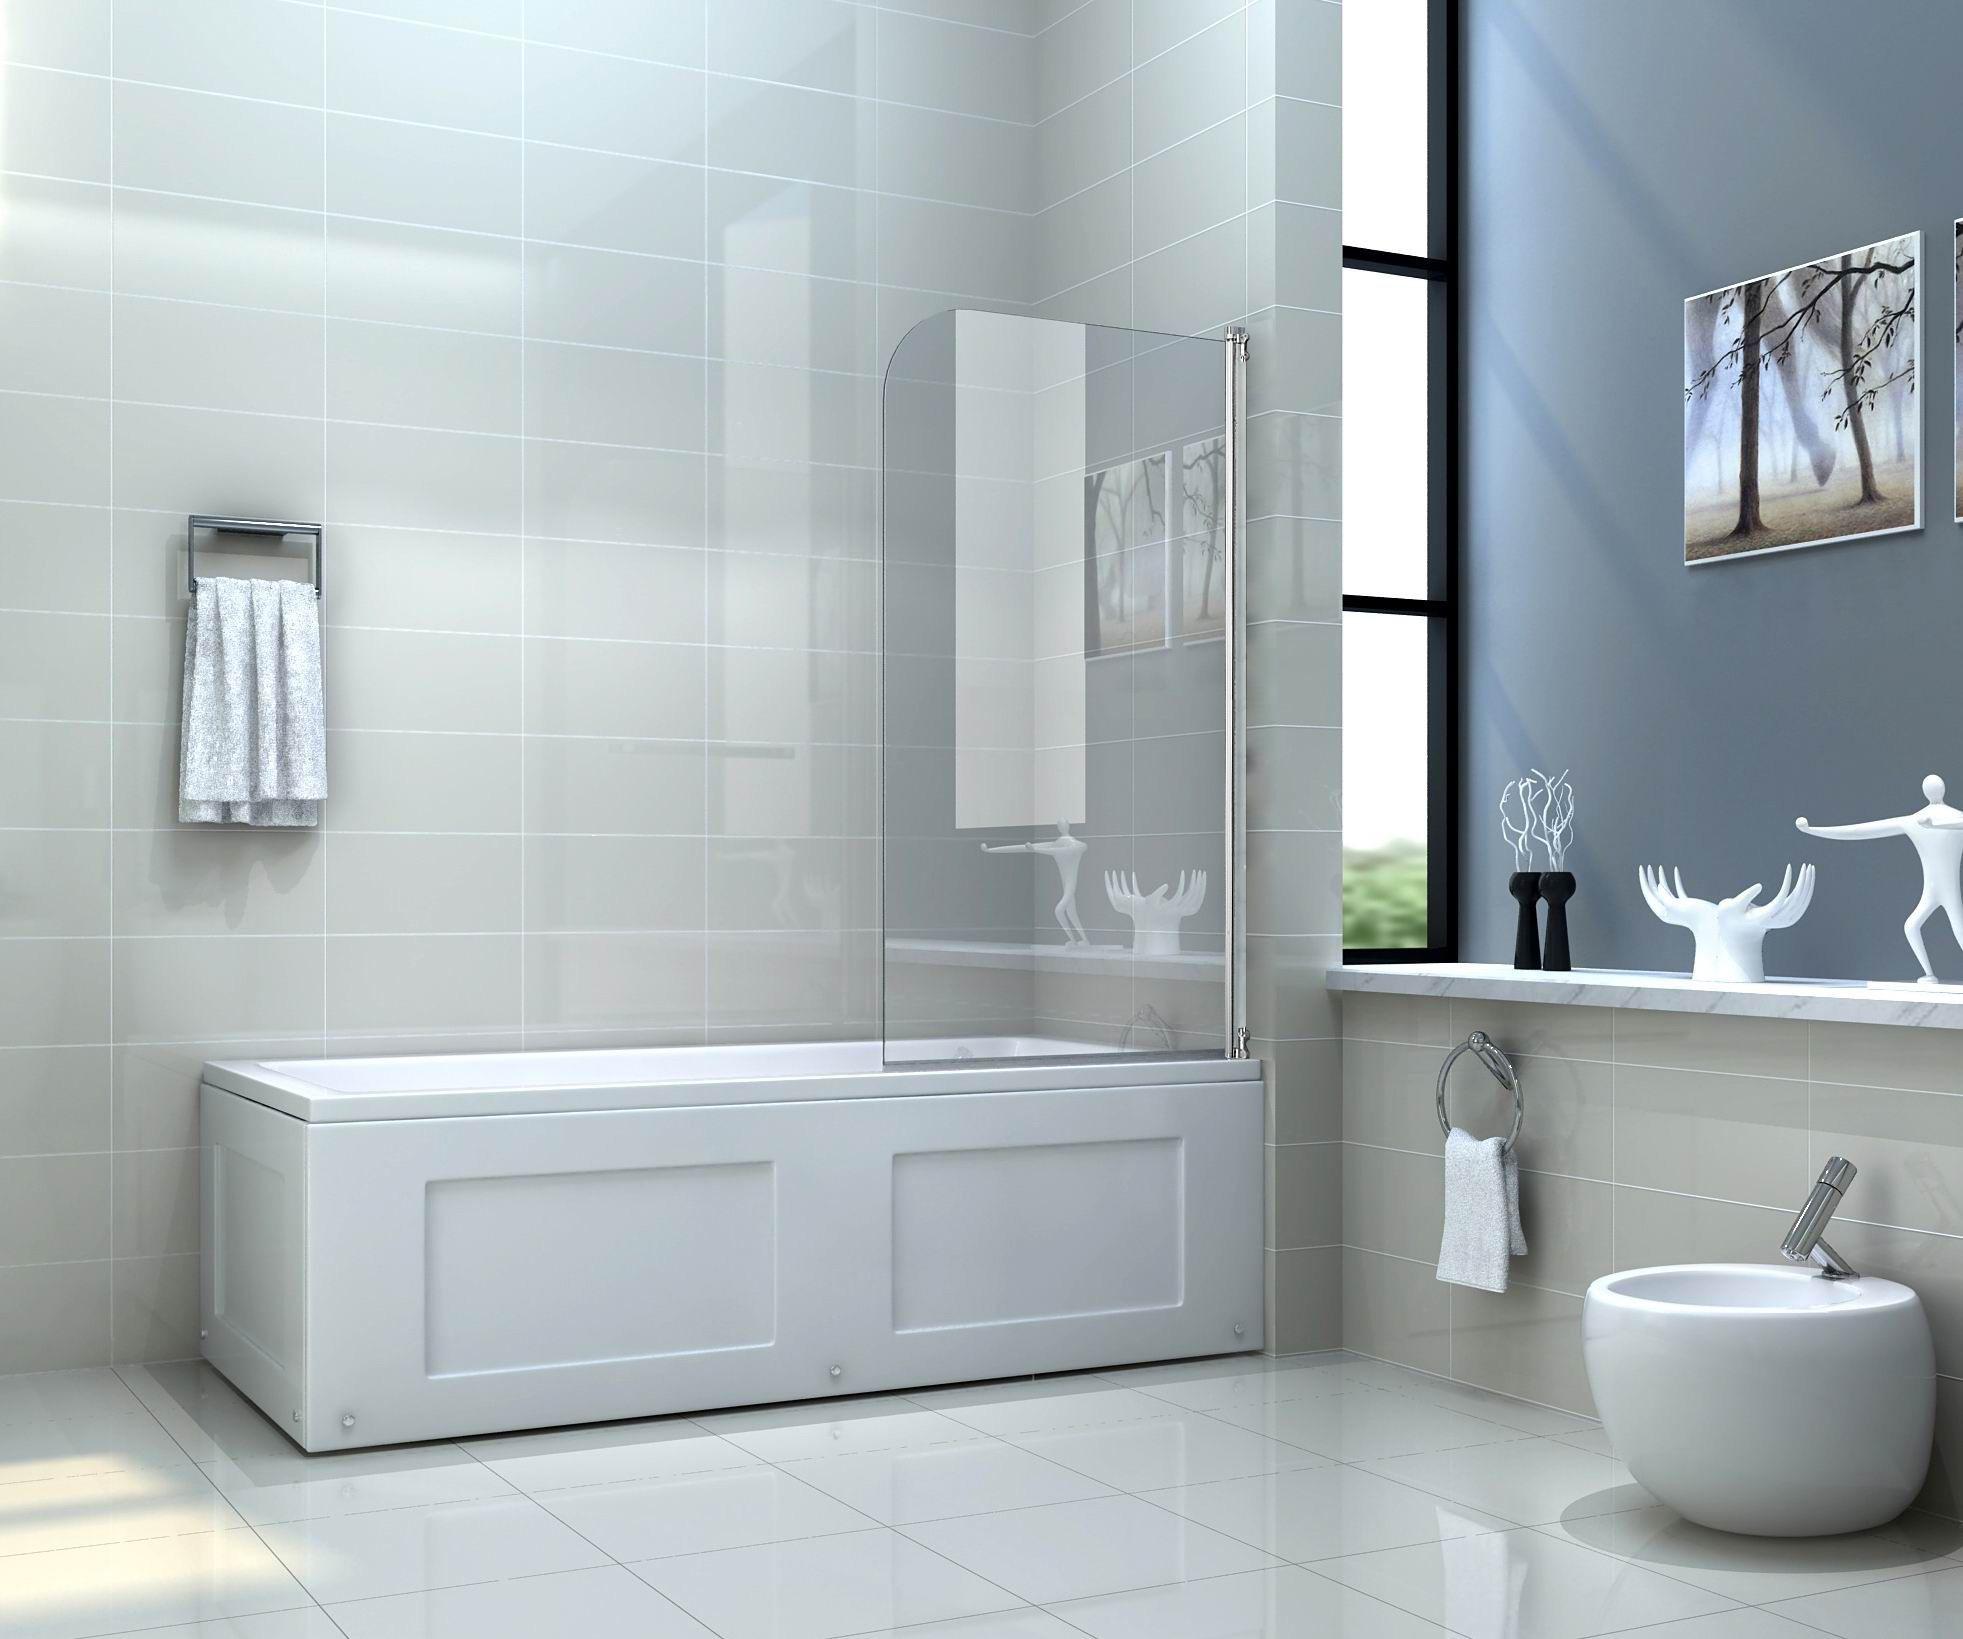 Duschtrennwand Rono (Badewanne)